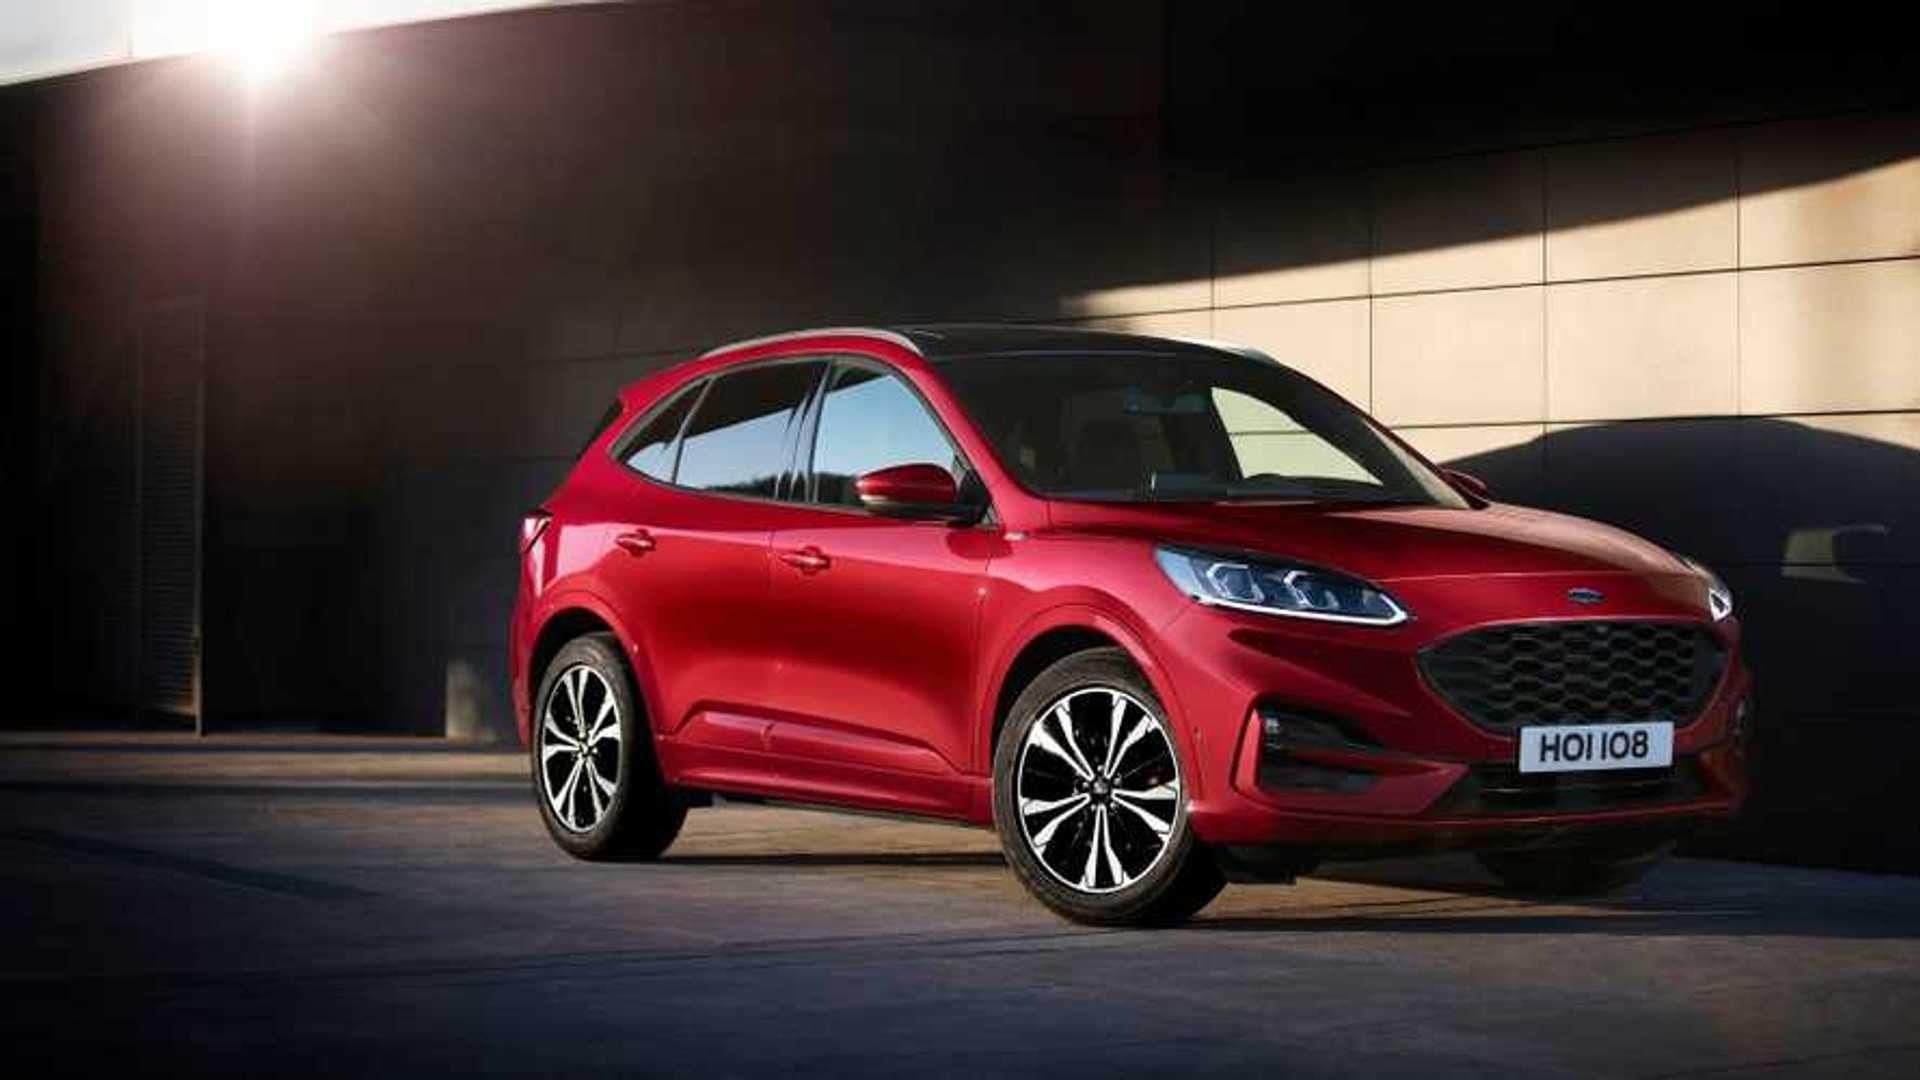 Ford Kuga PHEV Starts At €39,300 In Germany